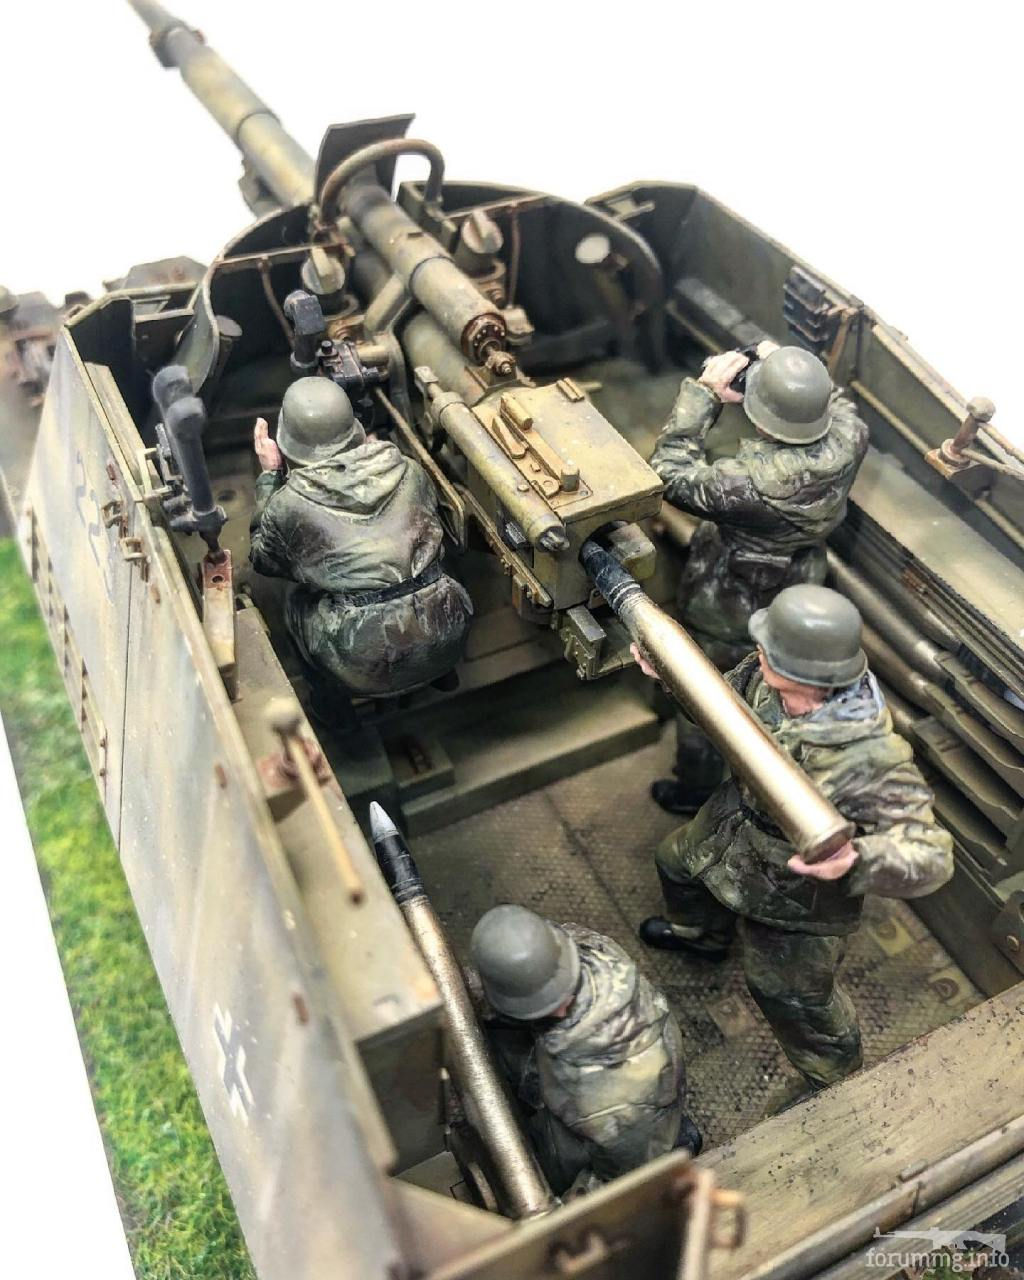 131585 - Модели бронетехники